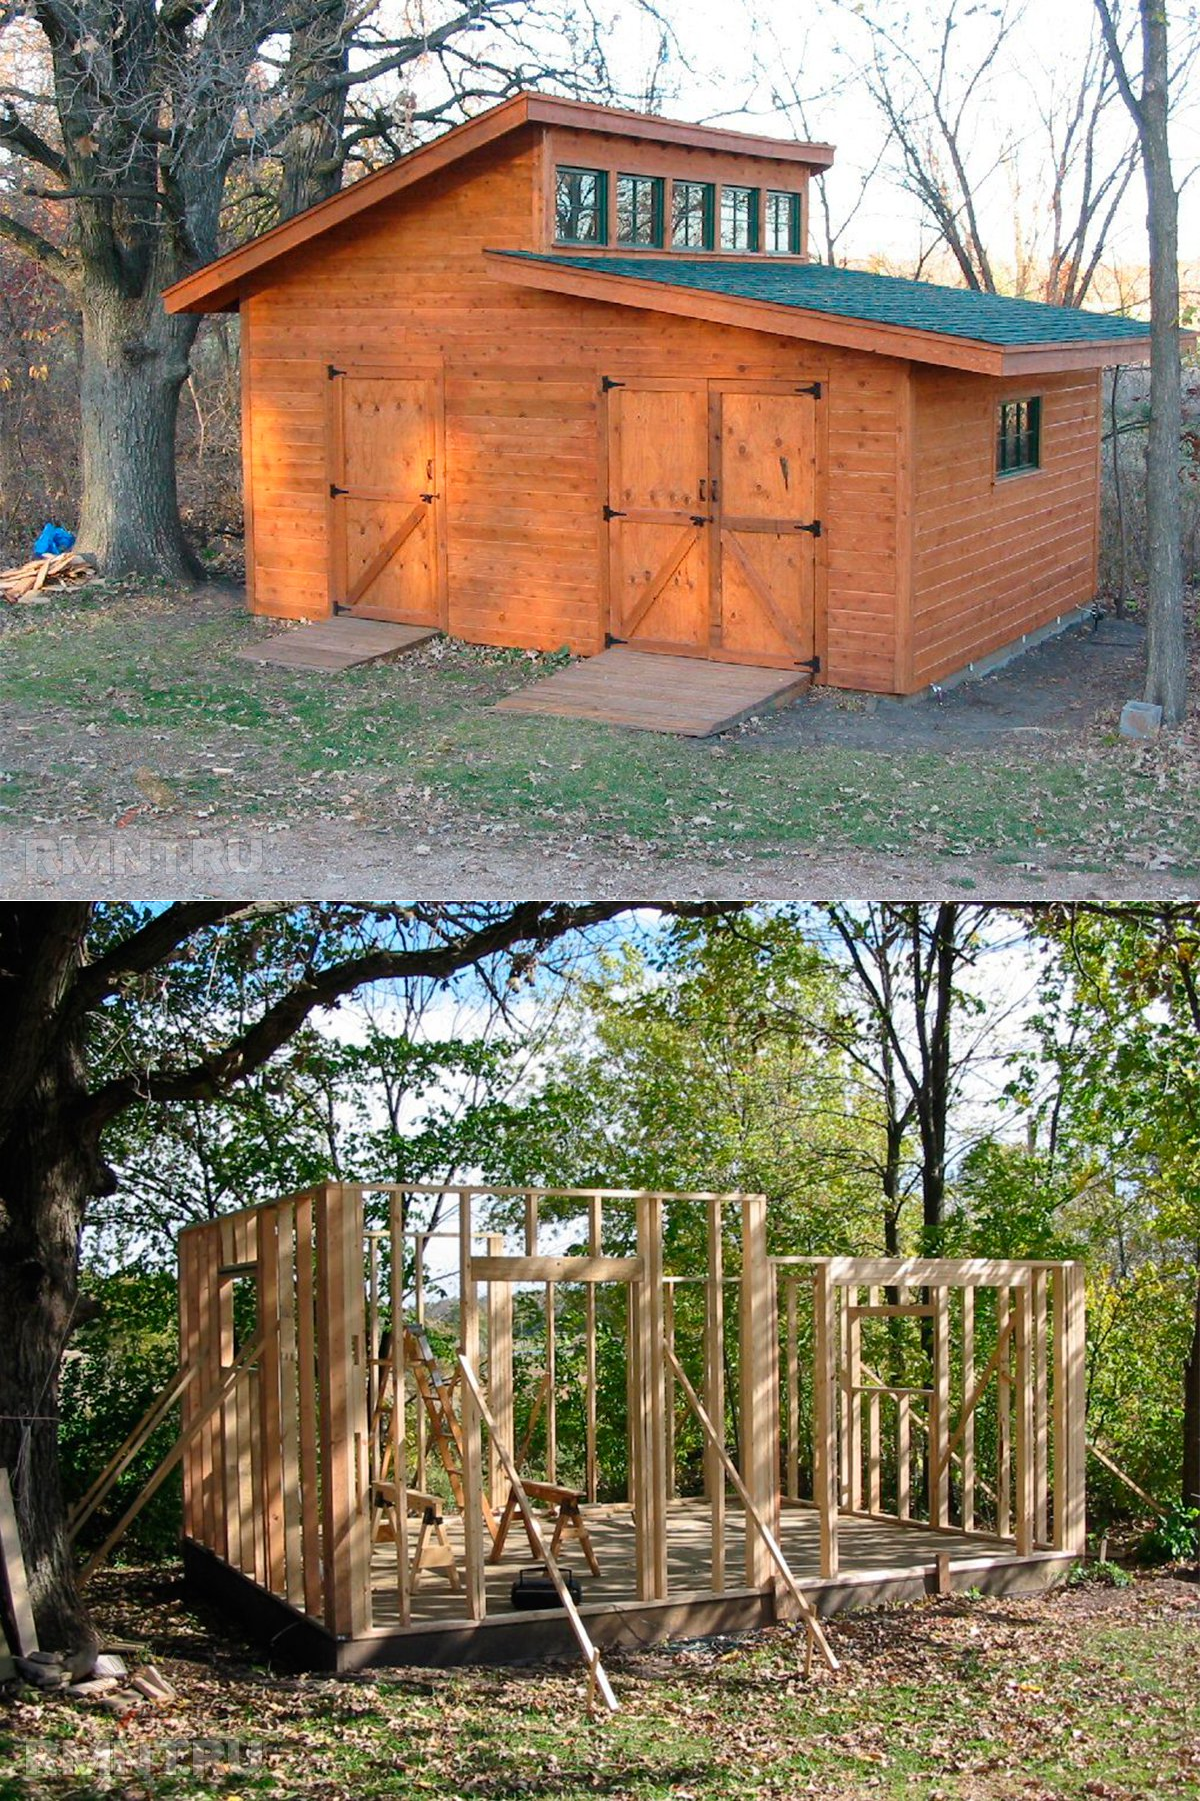 Сарай своими руками: 110 фото и видео мастер-класс постройки сарая для дома и дачи